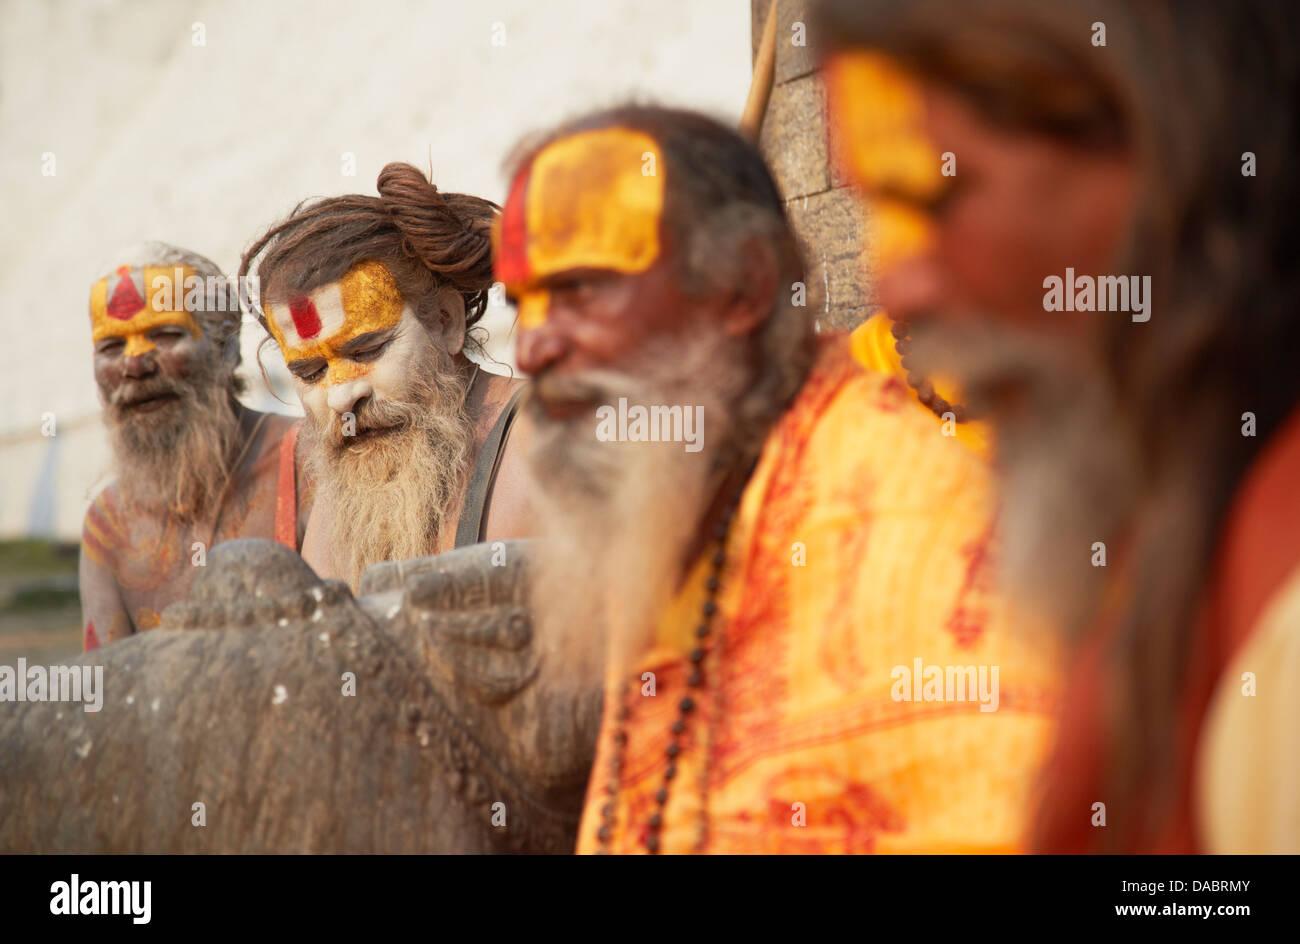 Sadhus (Holy men) at Pashupatinath Temple, Kathmandu, Nepal, Asia - Stock Image